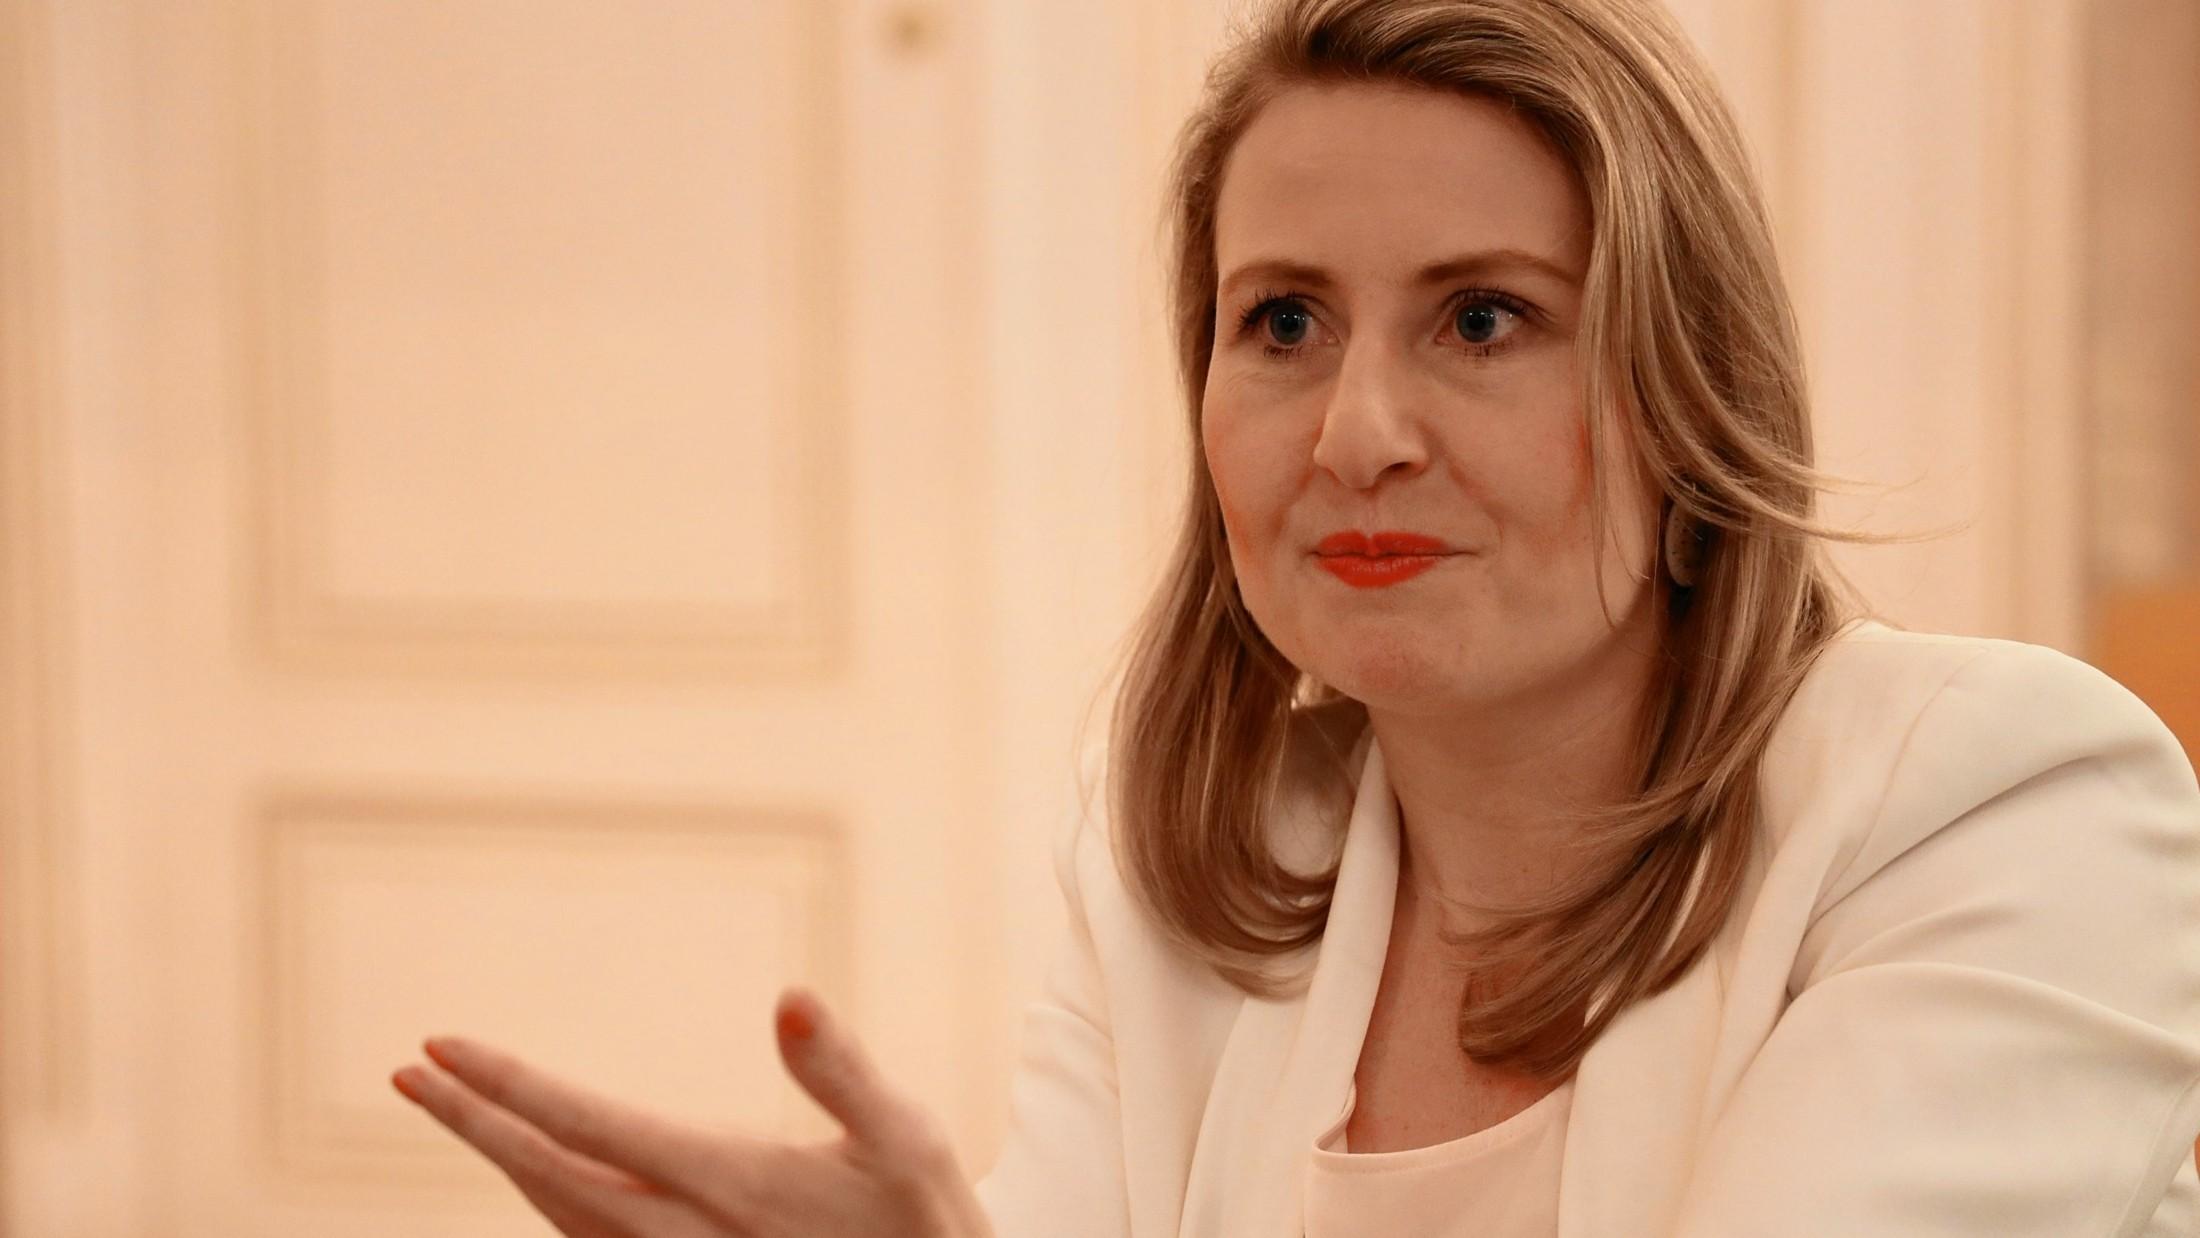 Sind Sie Ministerin fr alle Frauen, Frau Raab? | comunidadelectronica.com